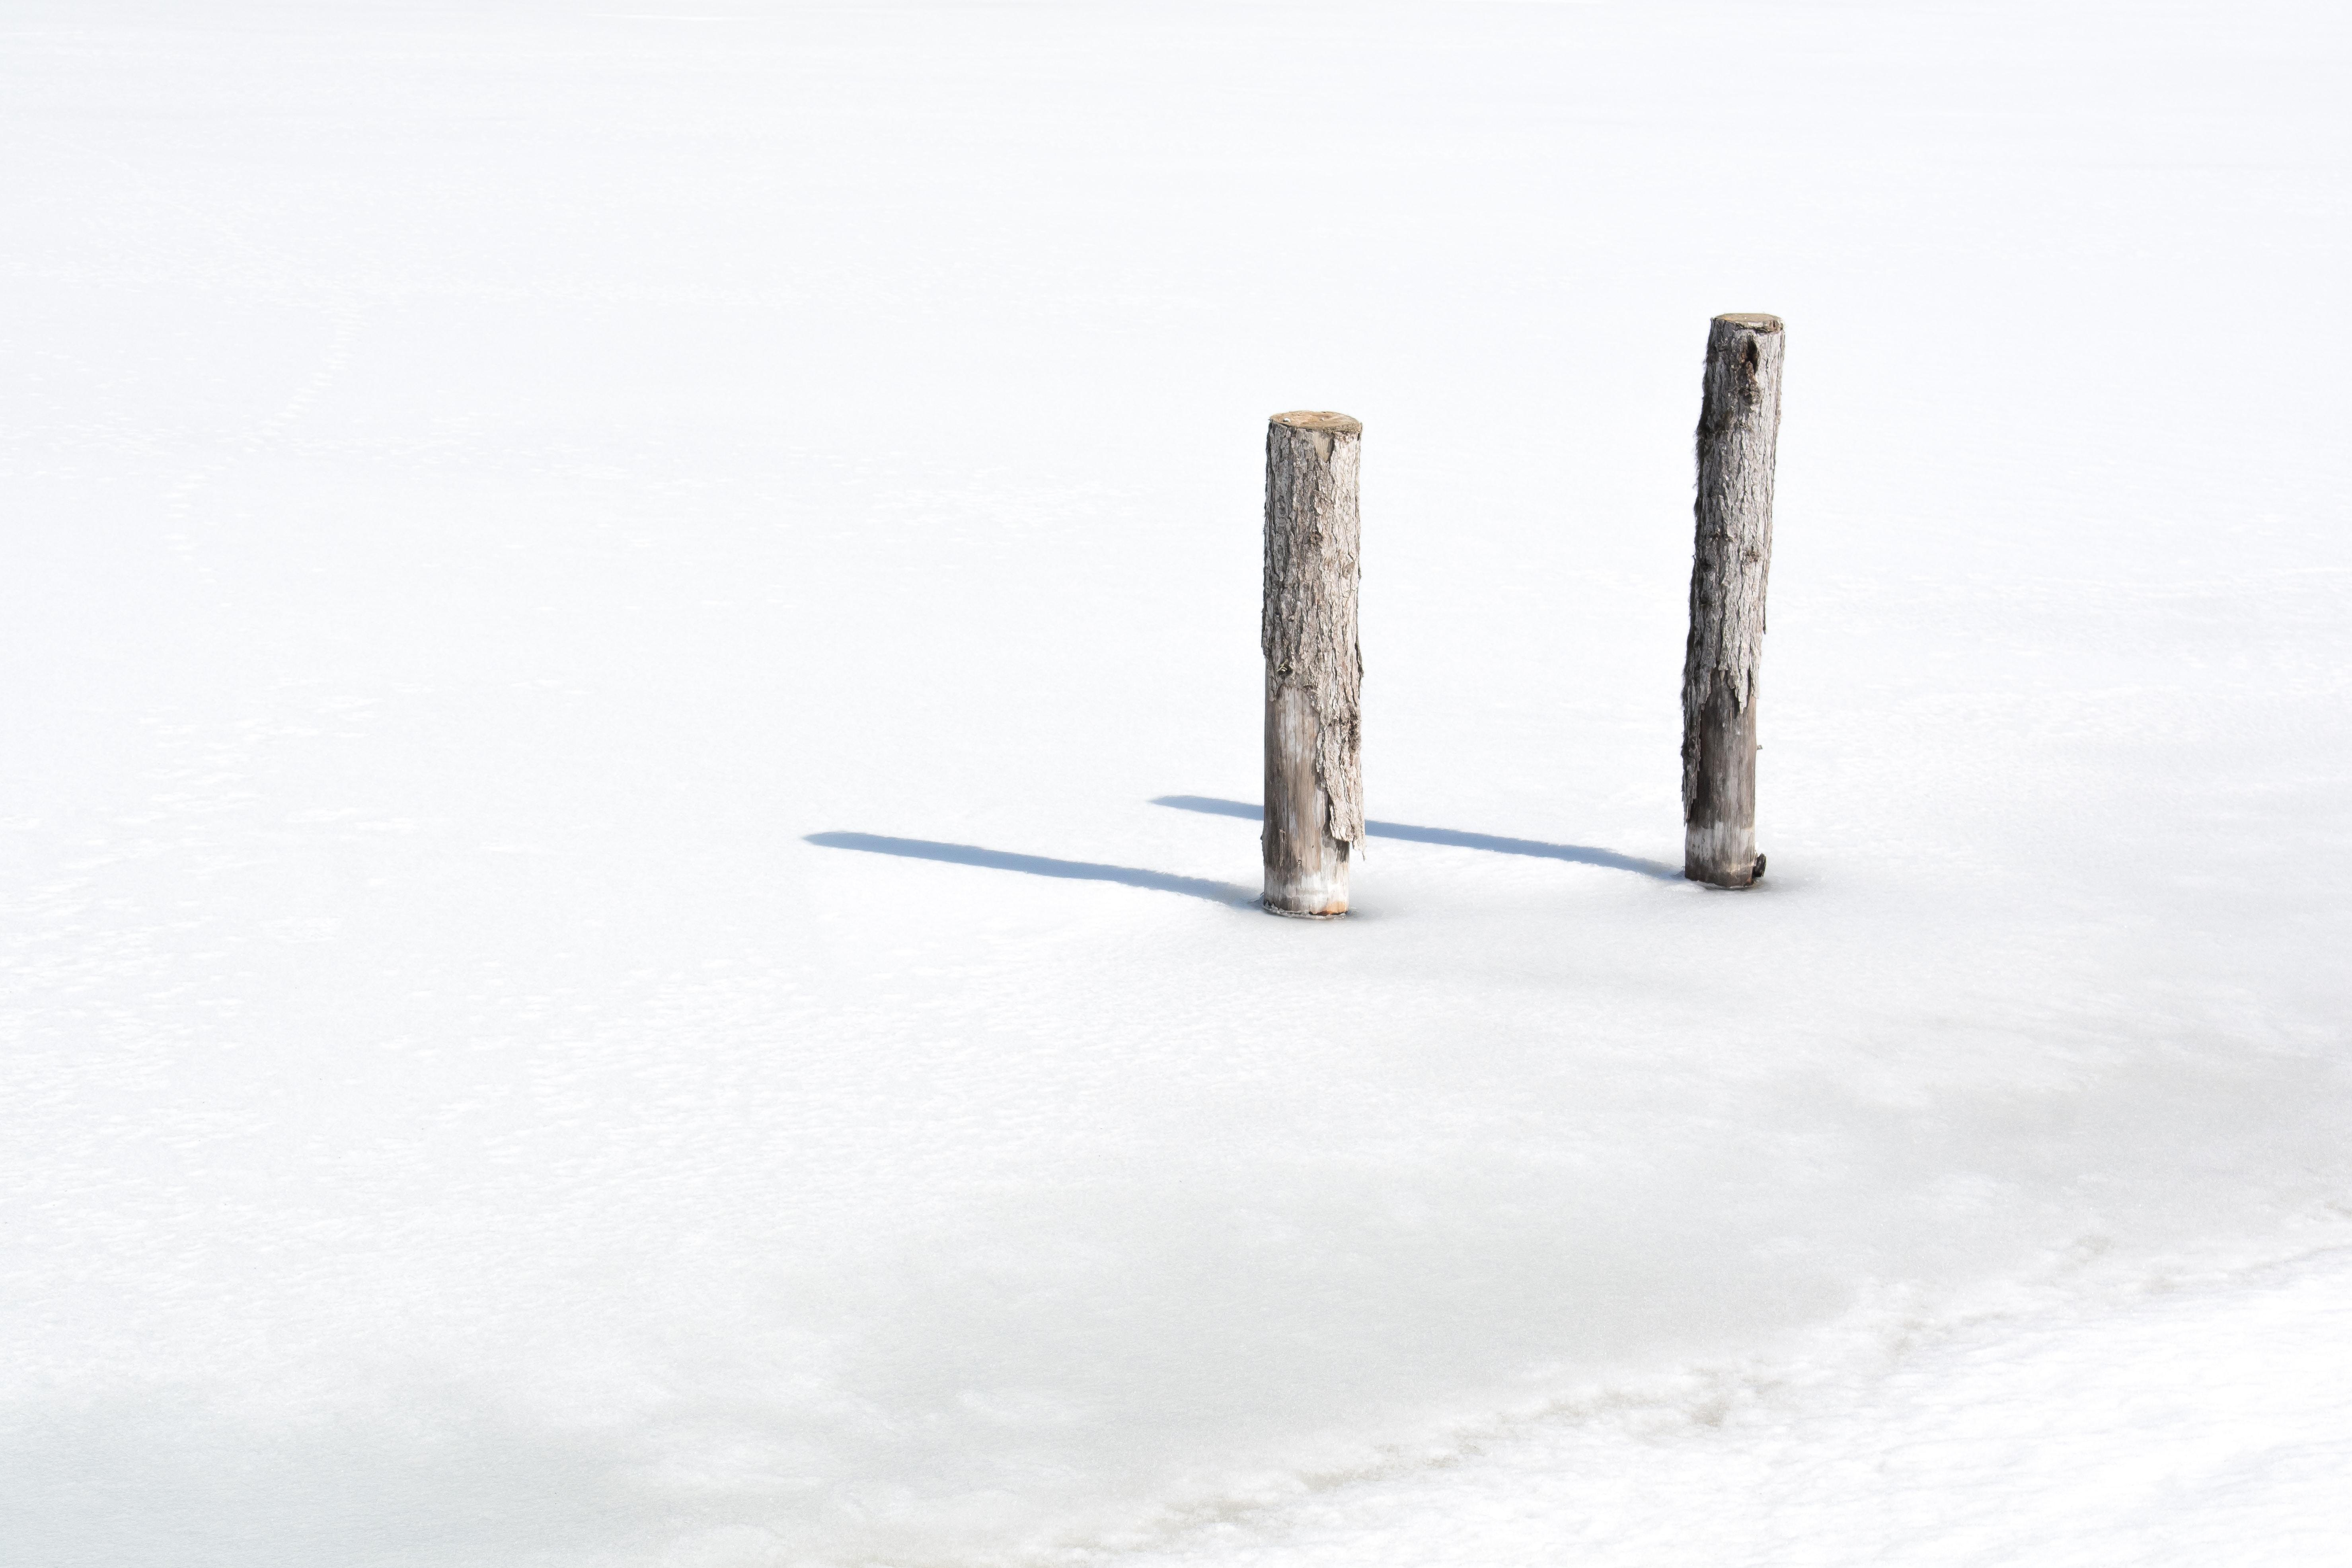 two tree logs